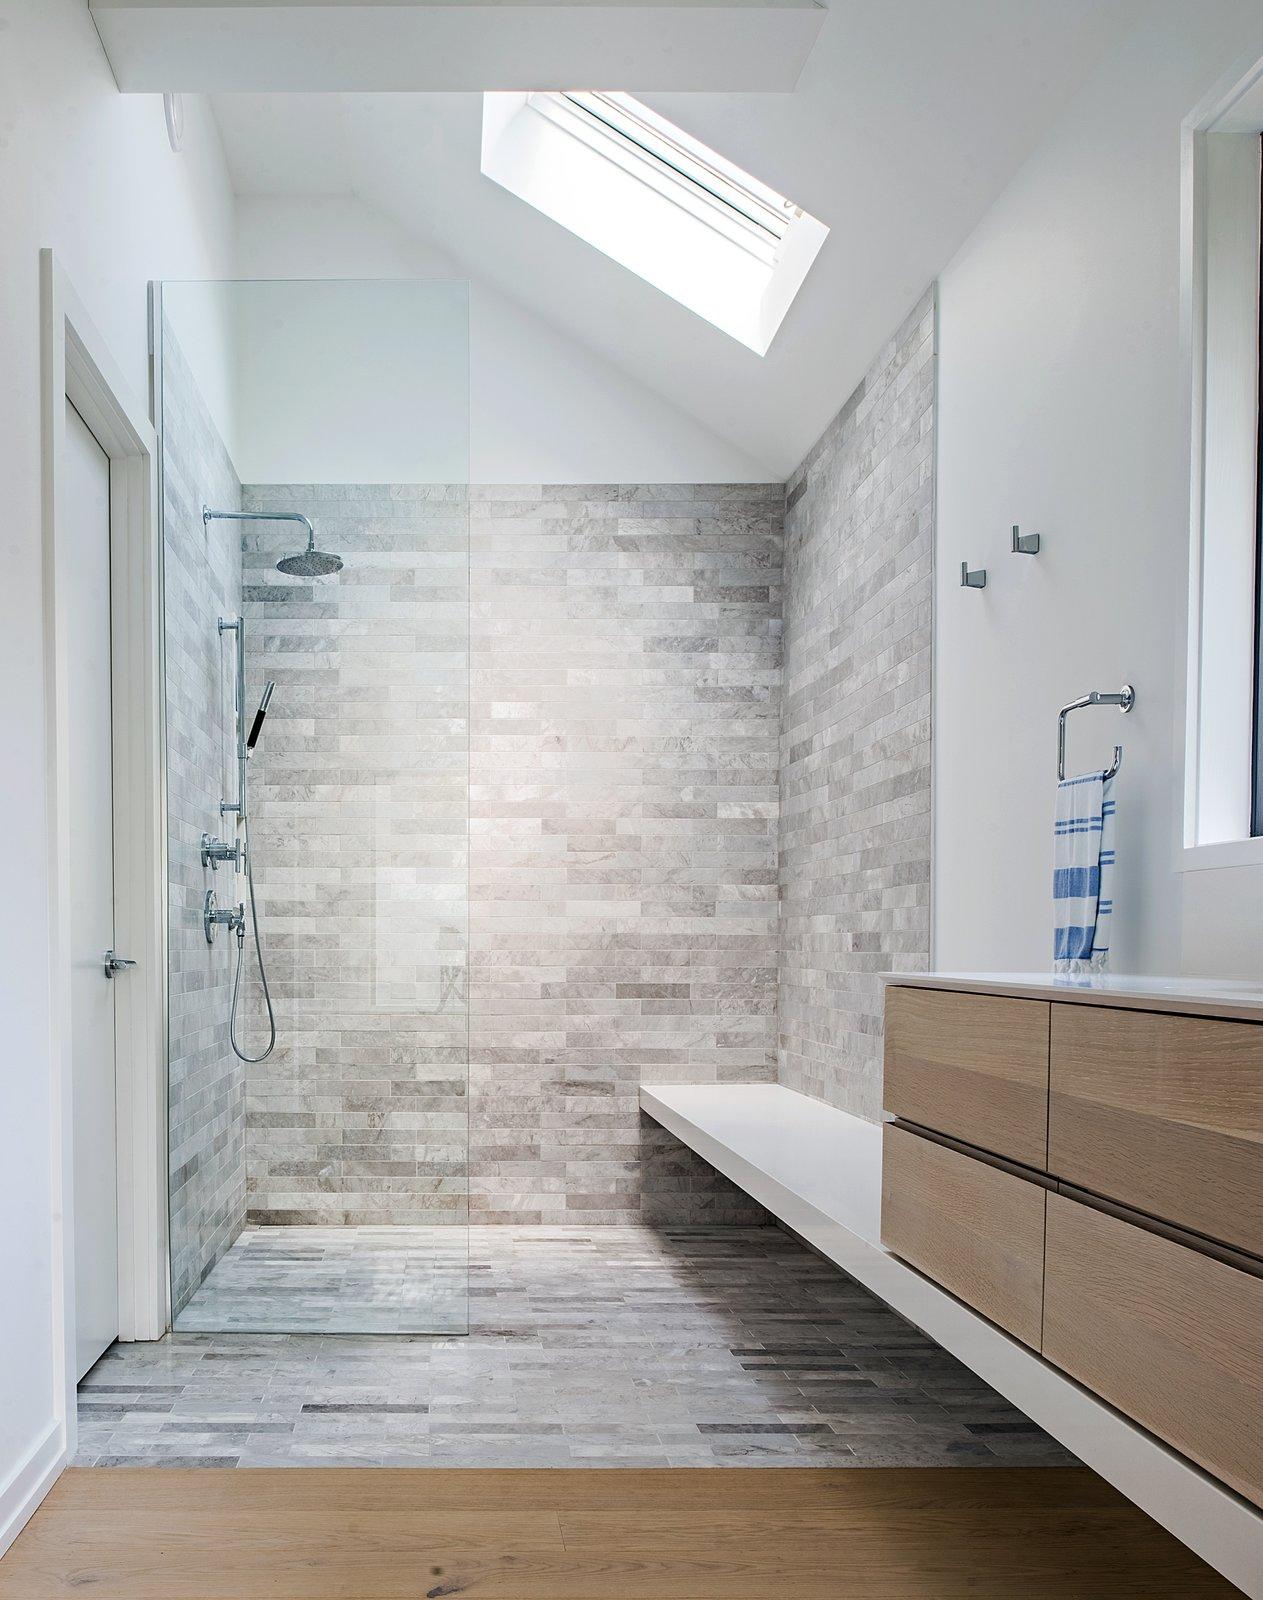 Bath Room, Engineered Quartz Counter, Light Hardwood Floor, Freestanding Tub, Undermount Sink, Open Shower, Ceiling Lighting, and Stone Tile Wall  Richview Residence